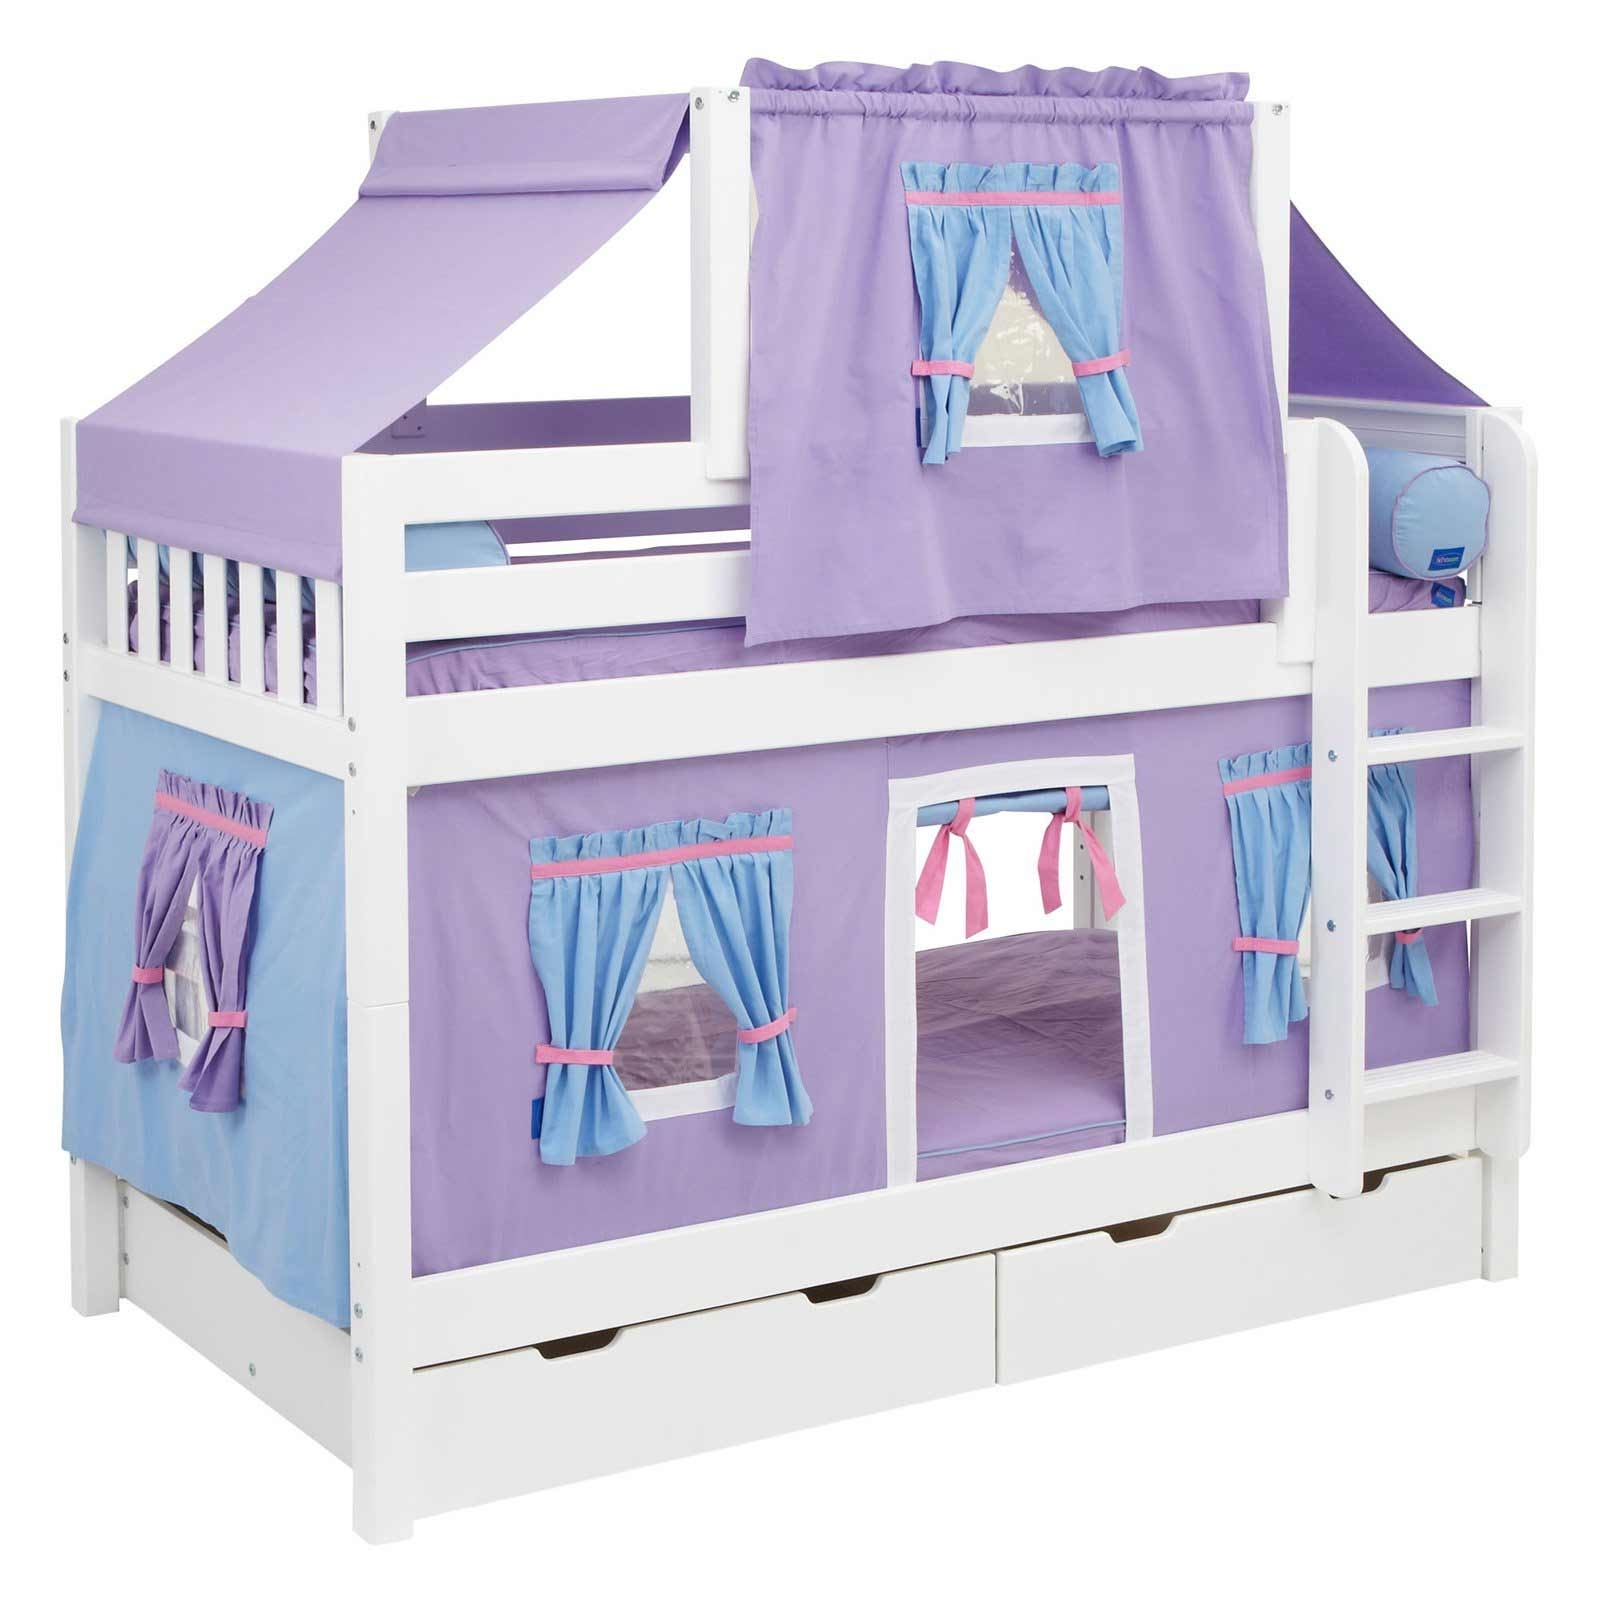 cutest bunk beds photo - 8